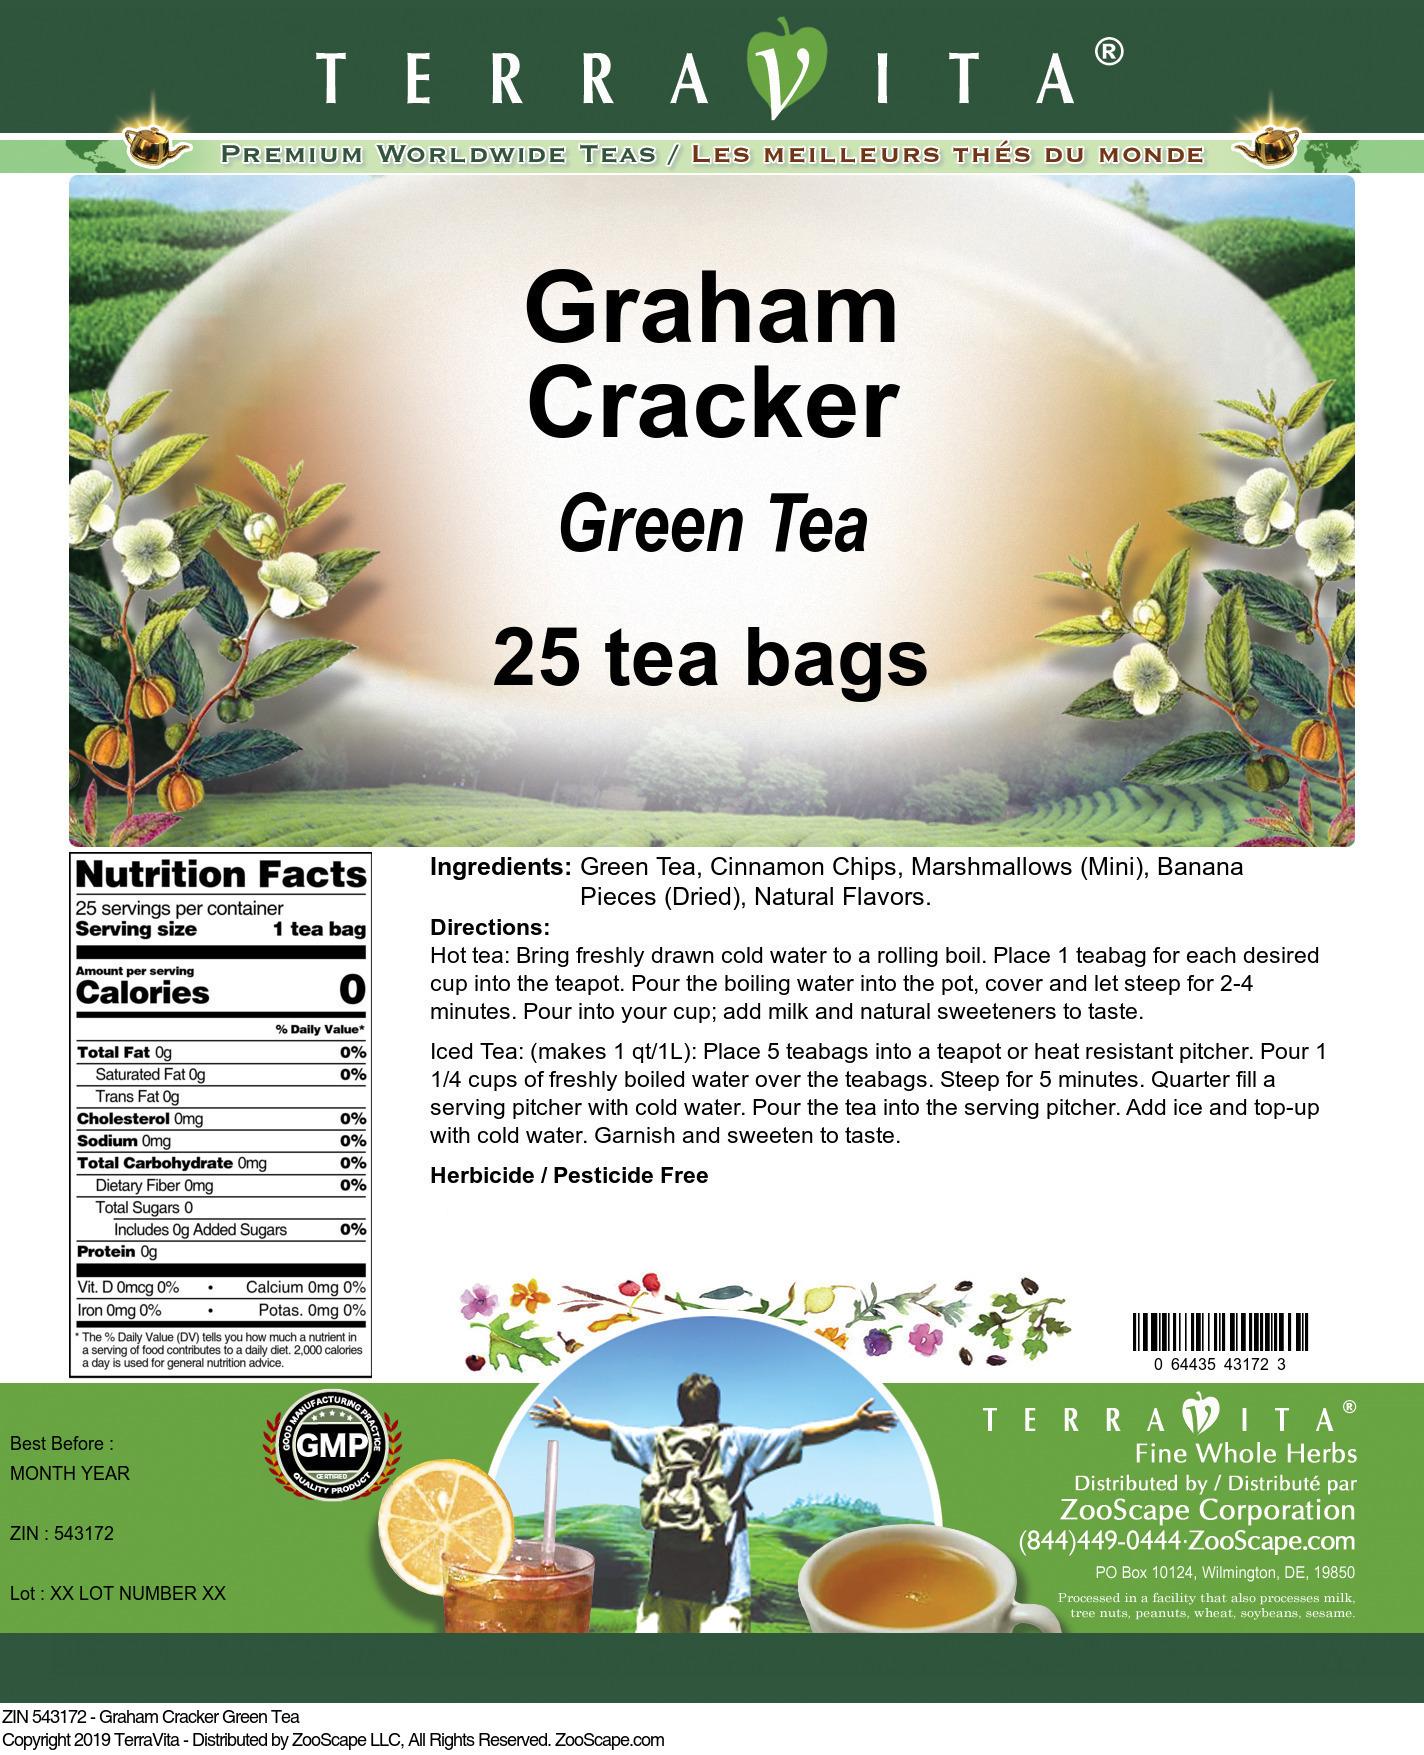 Graham Cracker Green Tea